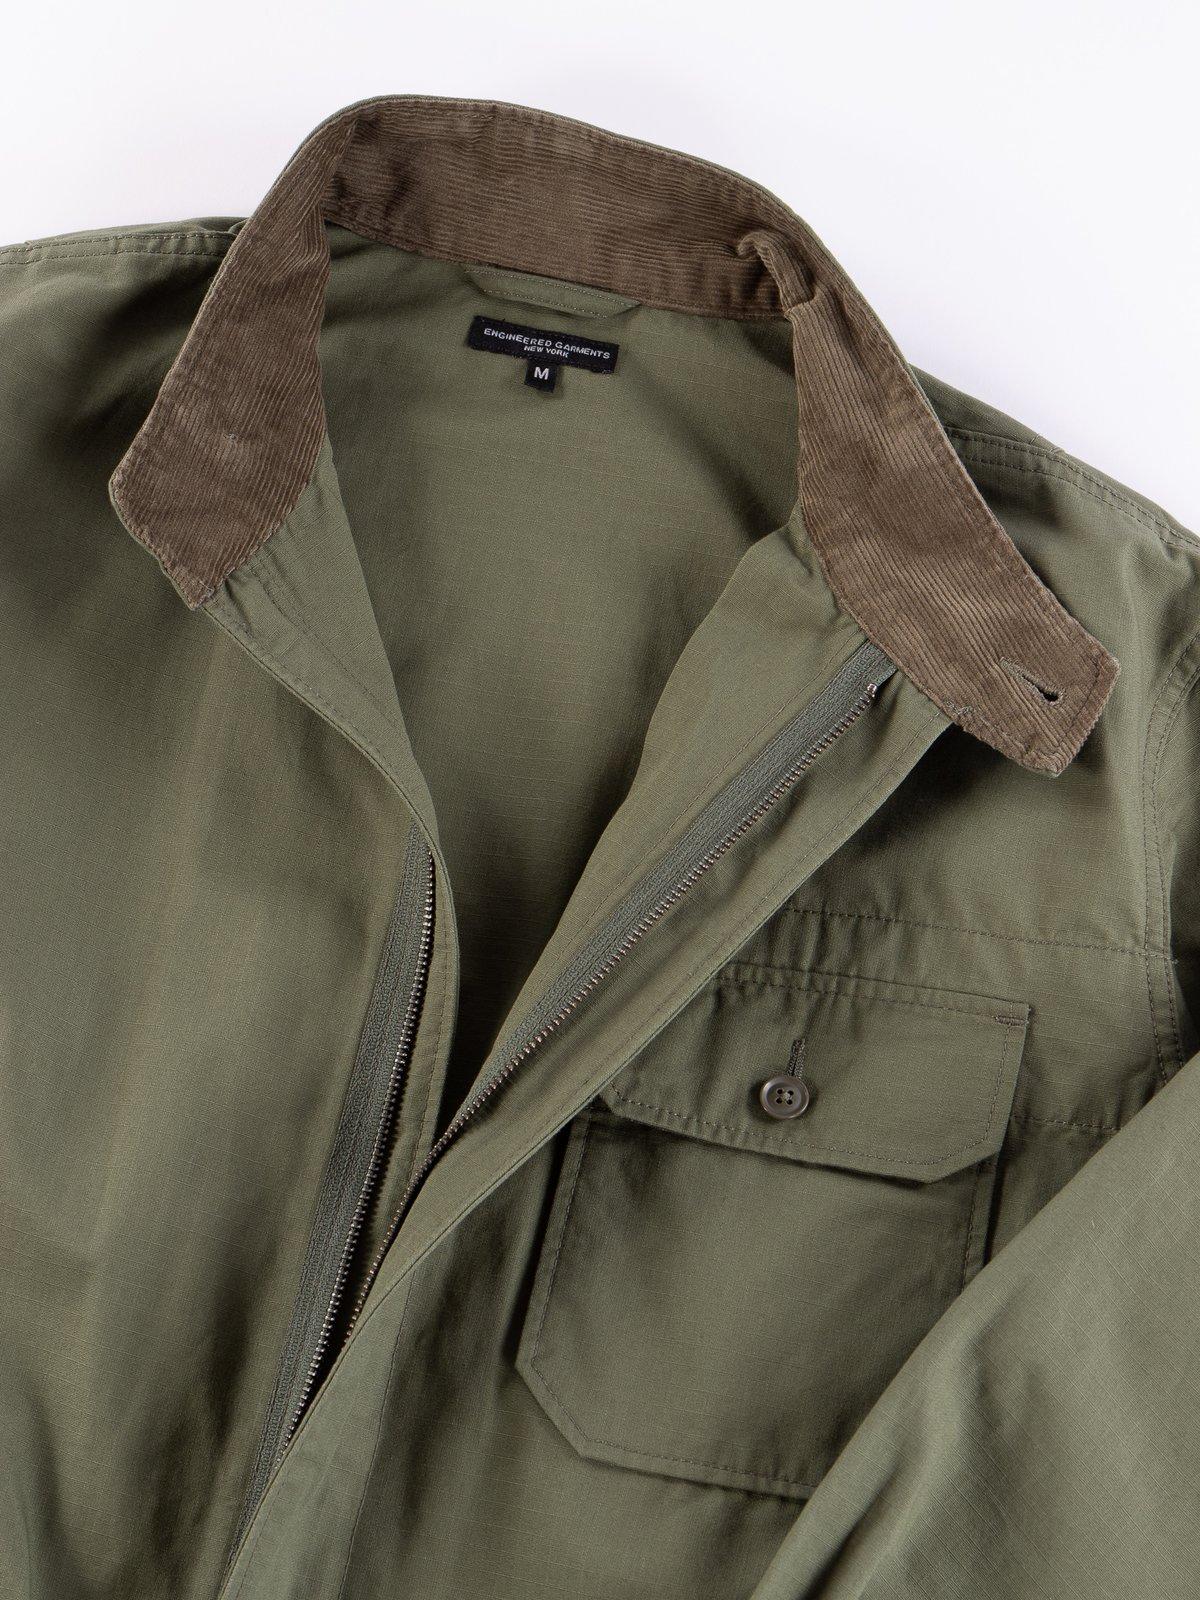 Olive Cotton Ripstop Boiler Suit - Image 6